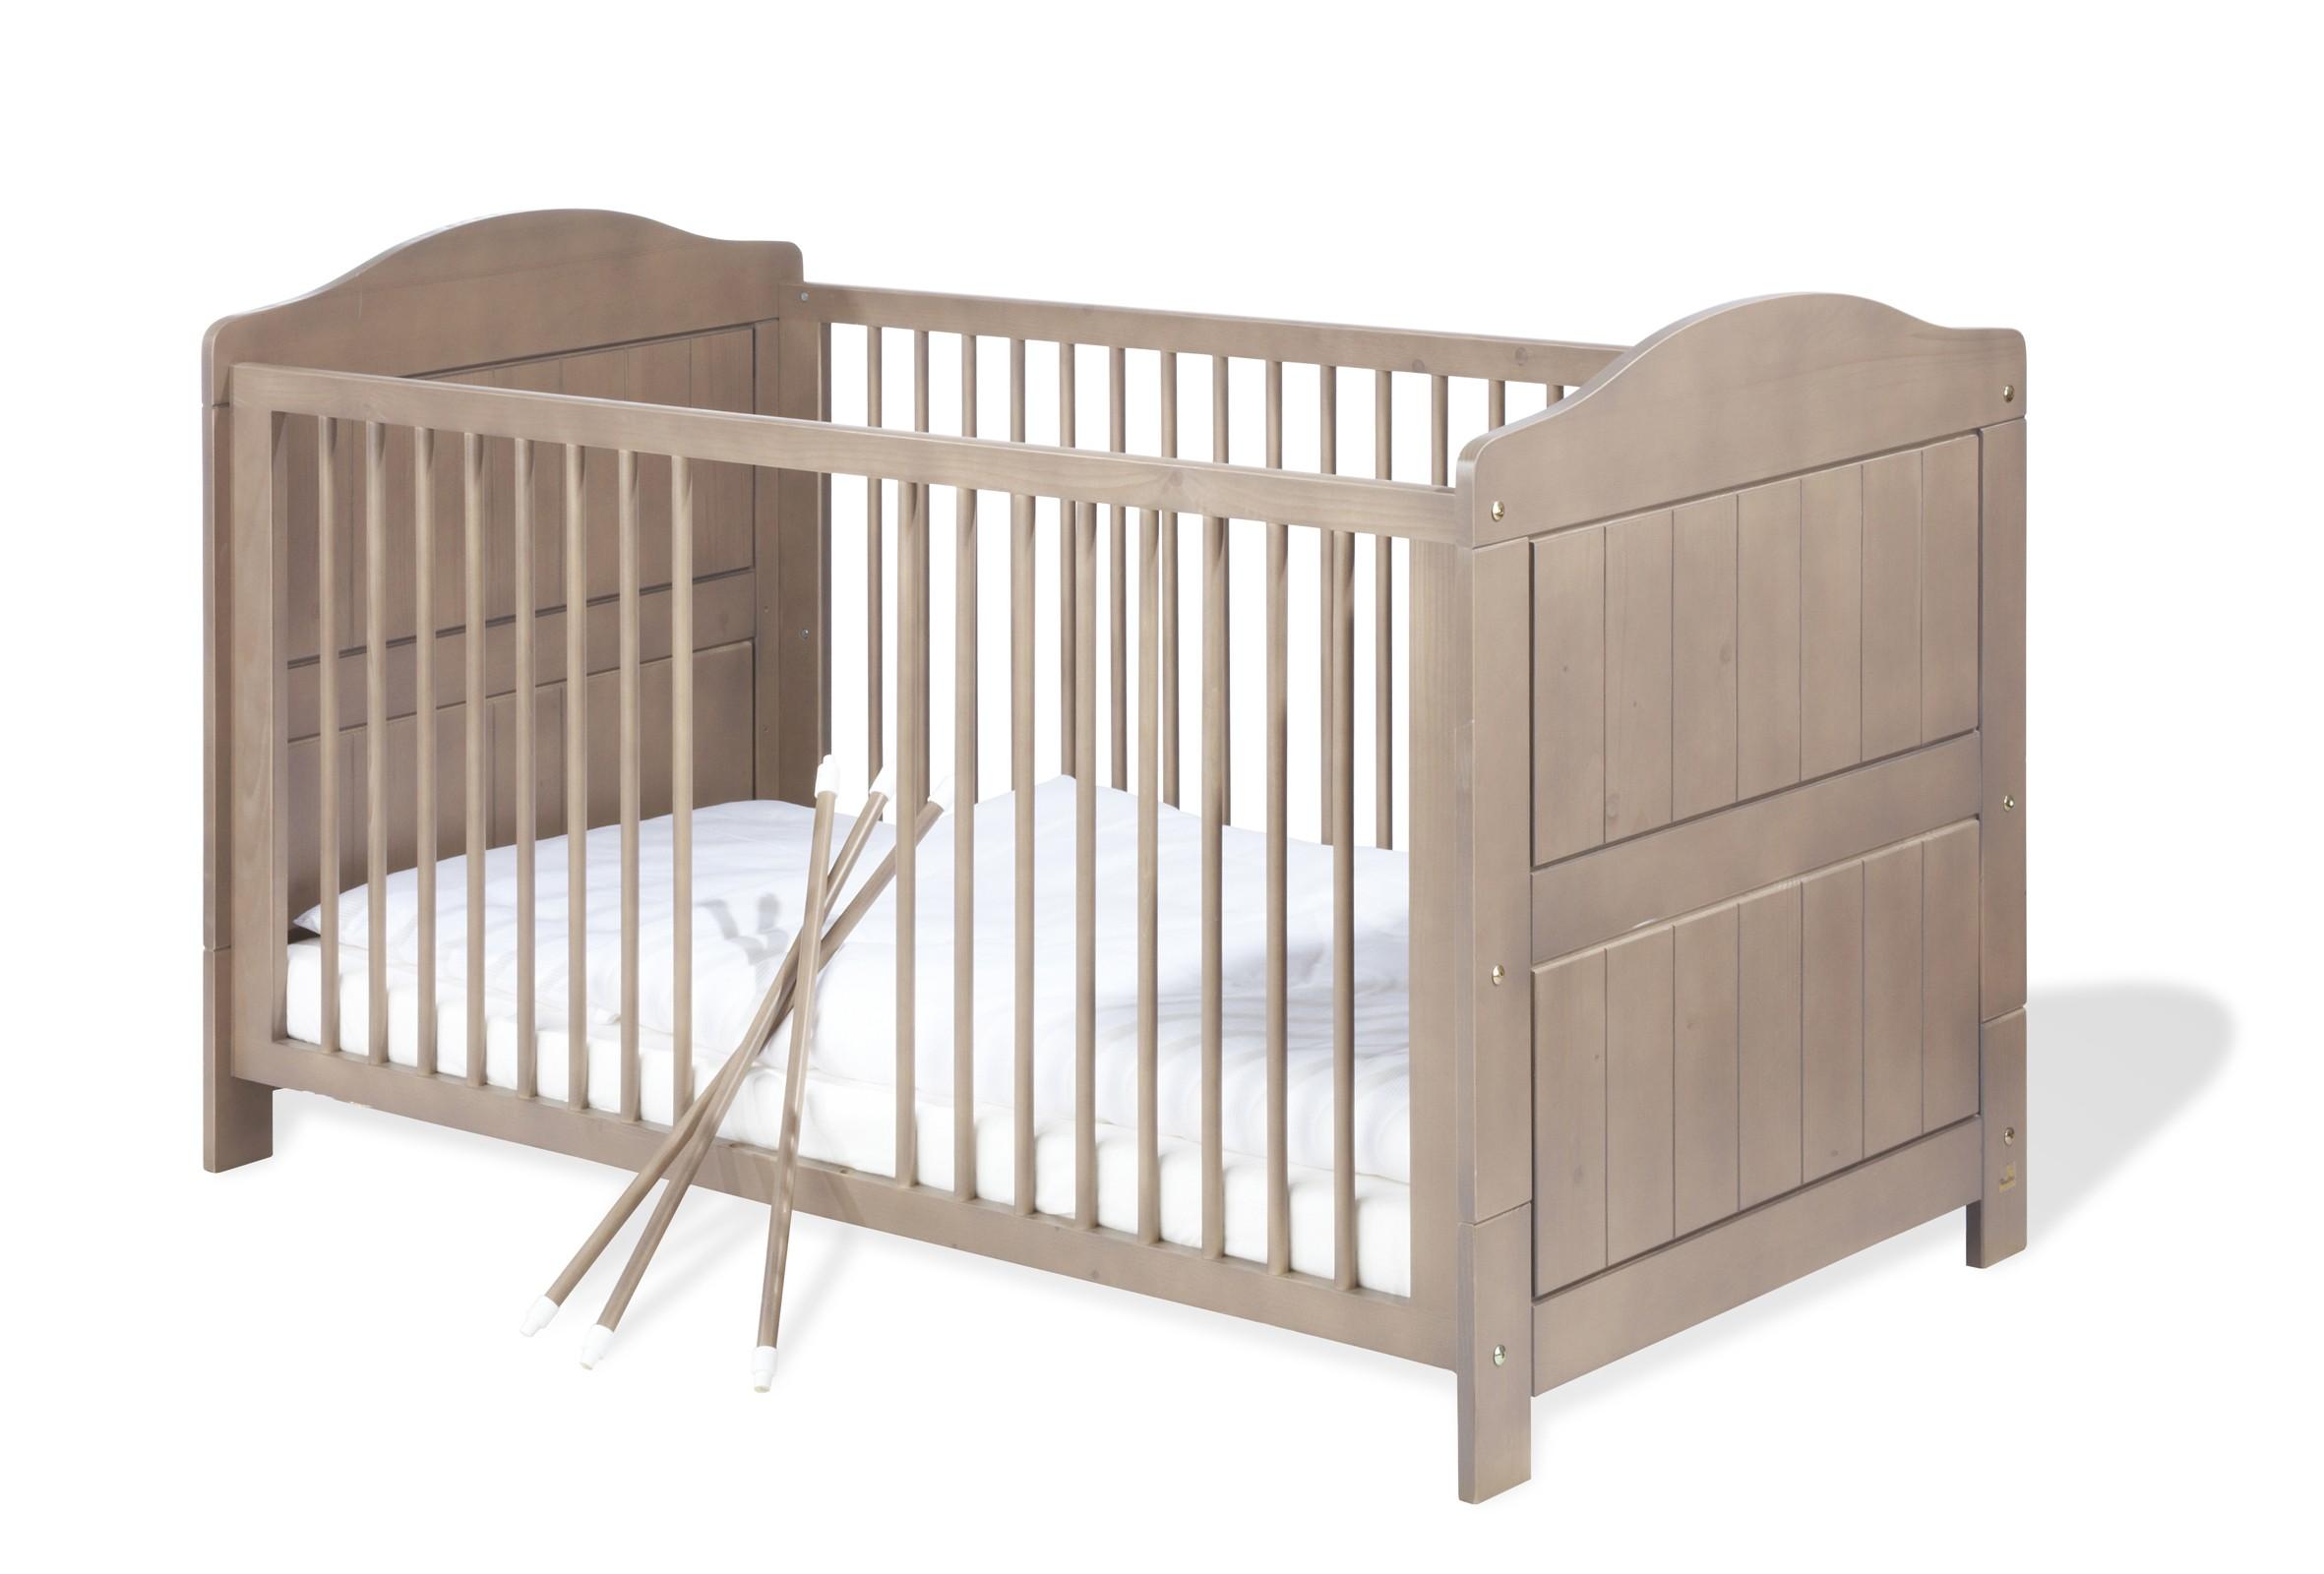 Kinderbetten test ▷ bestenliste testberichte